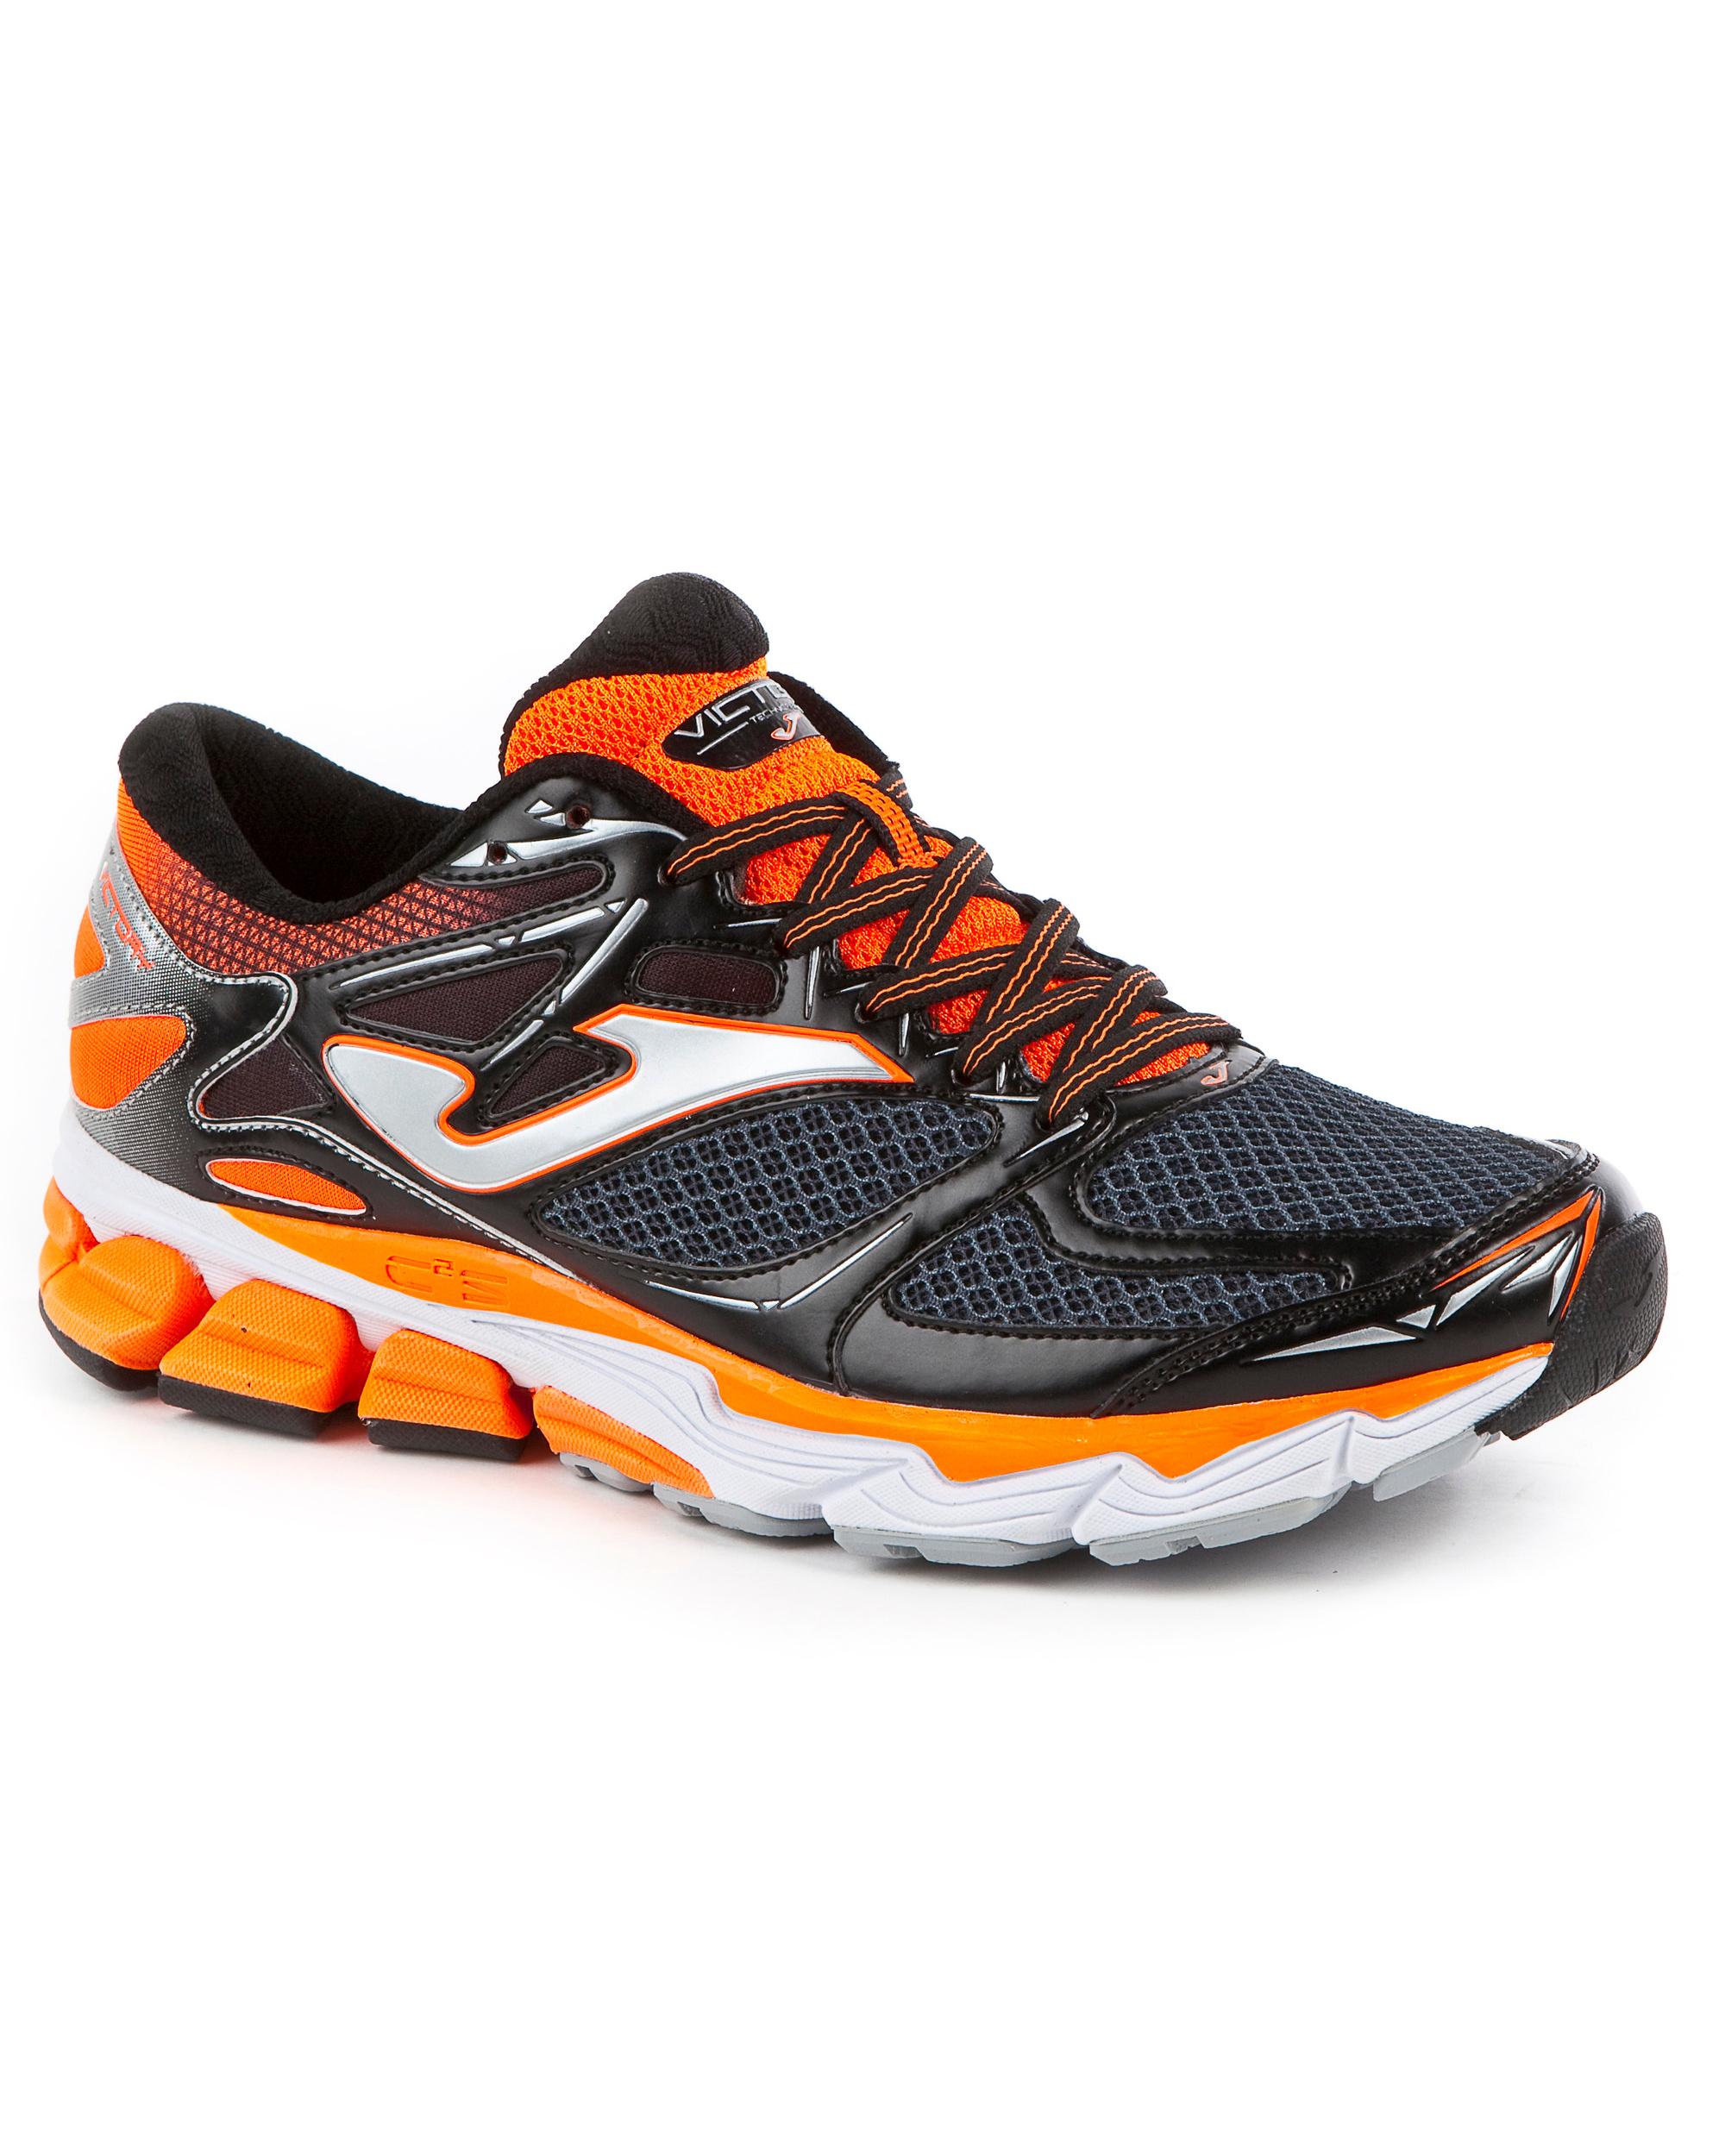 Joma SportSchuhe LaufSchuhe Sneakers Running Shoes Trainers Victory Herren 201